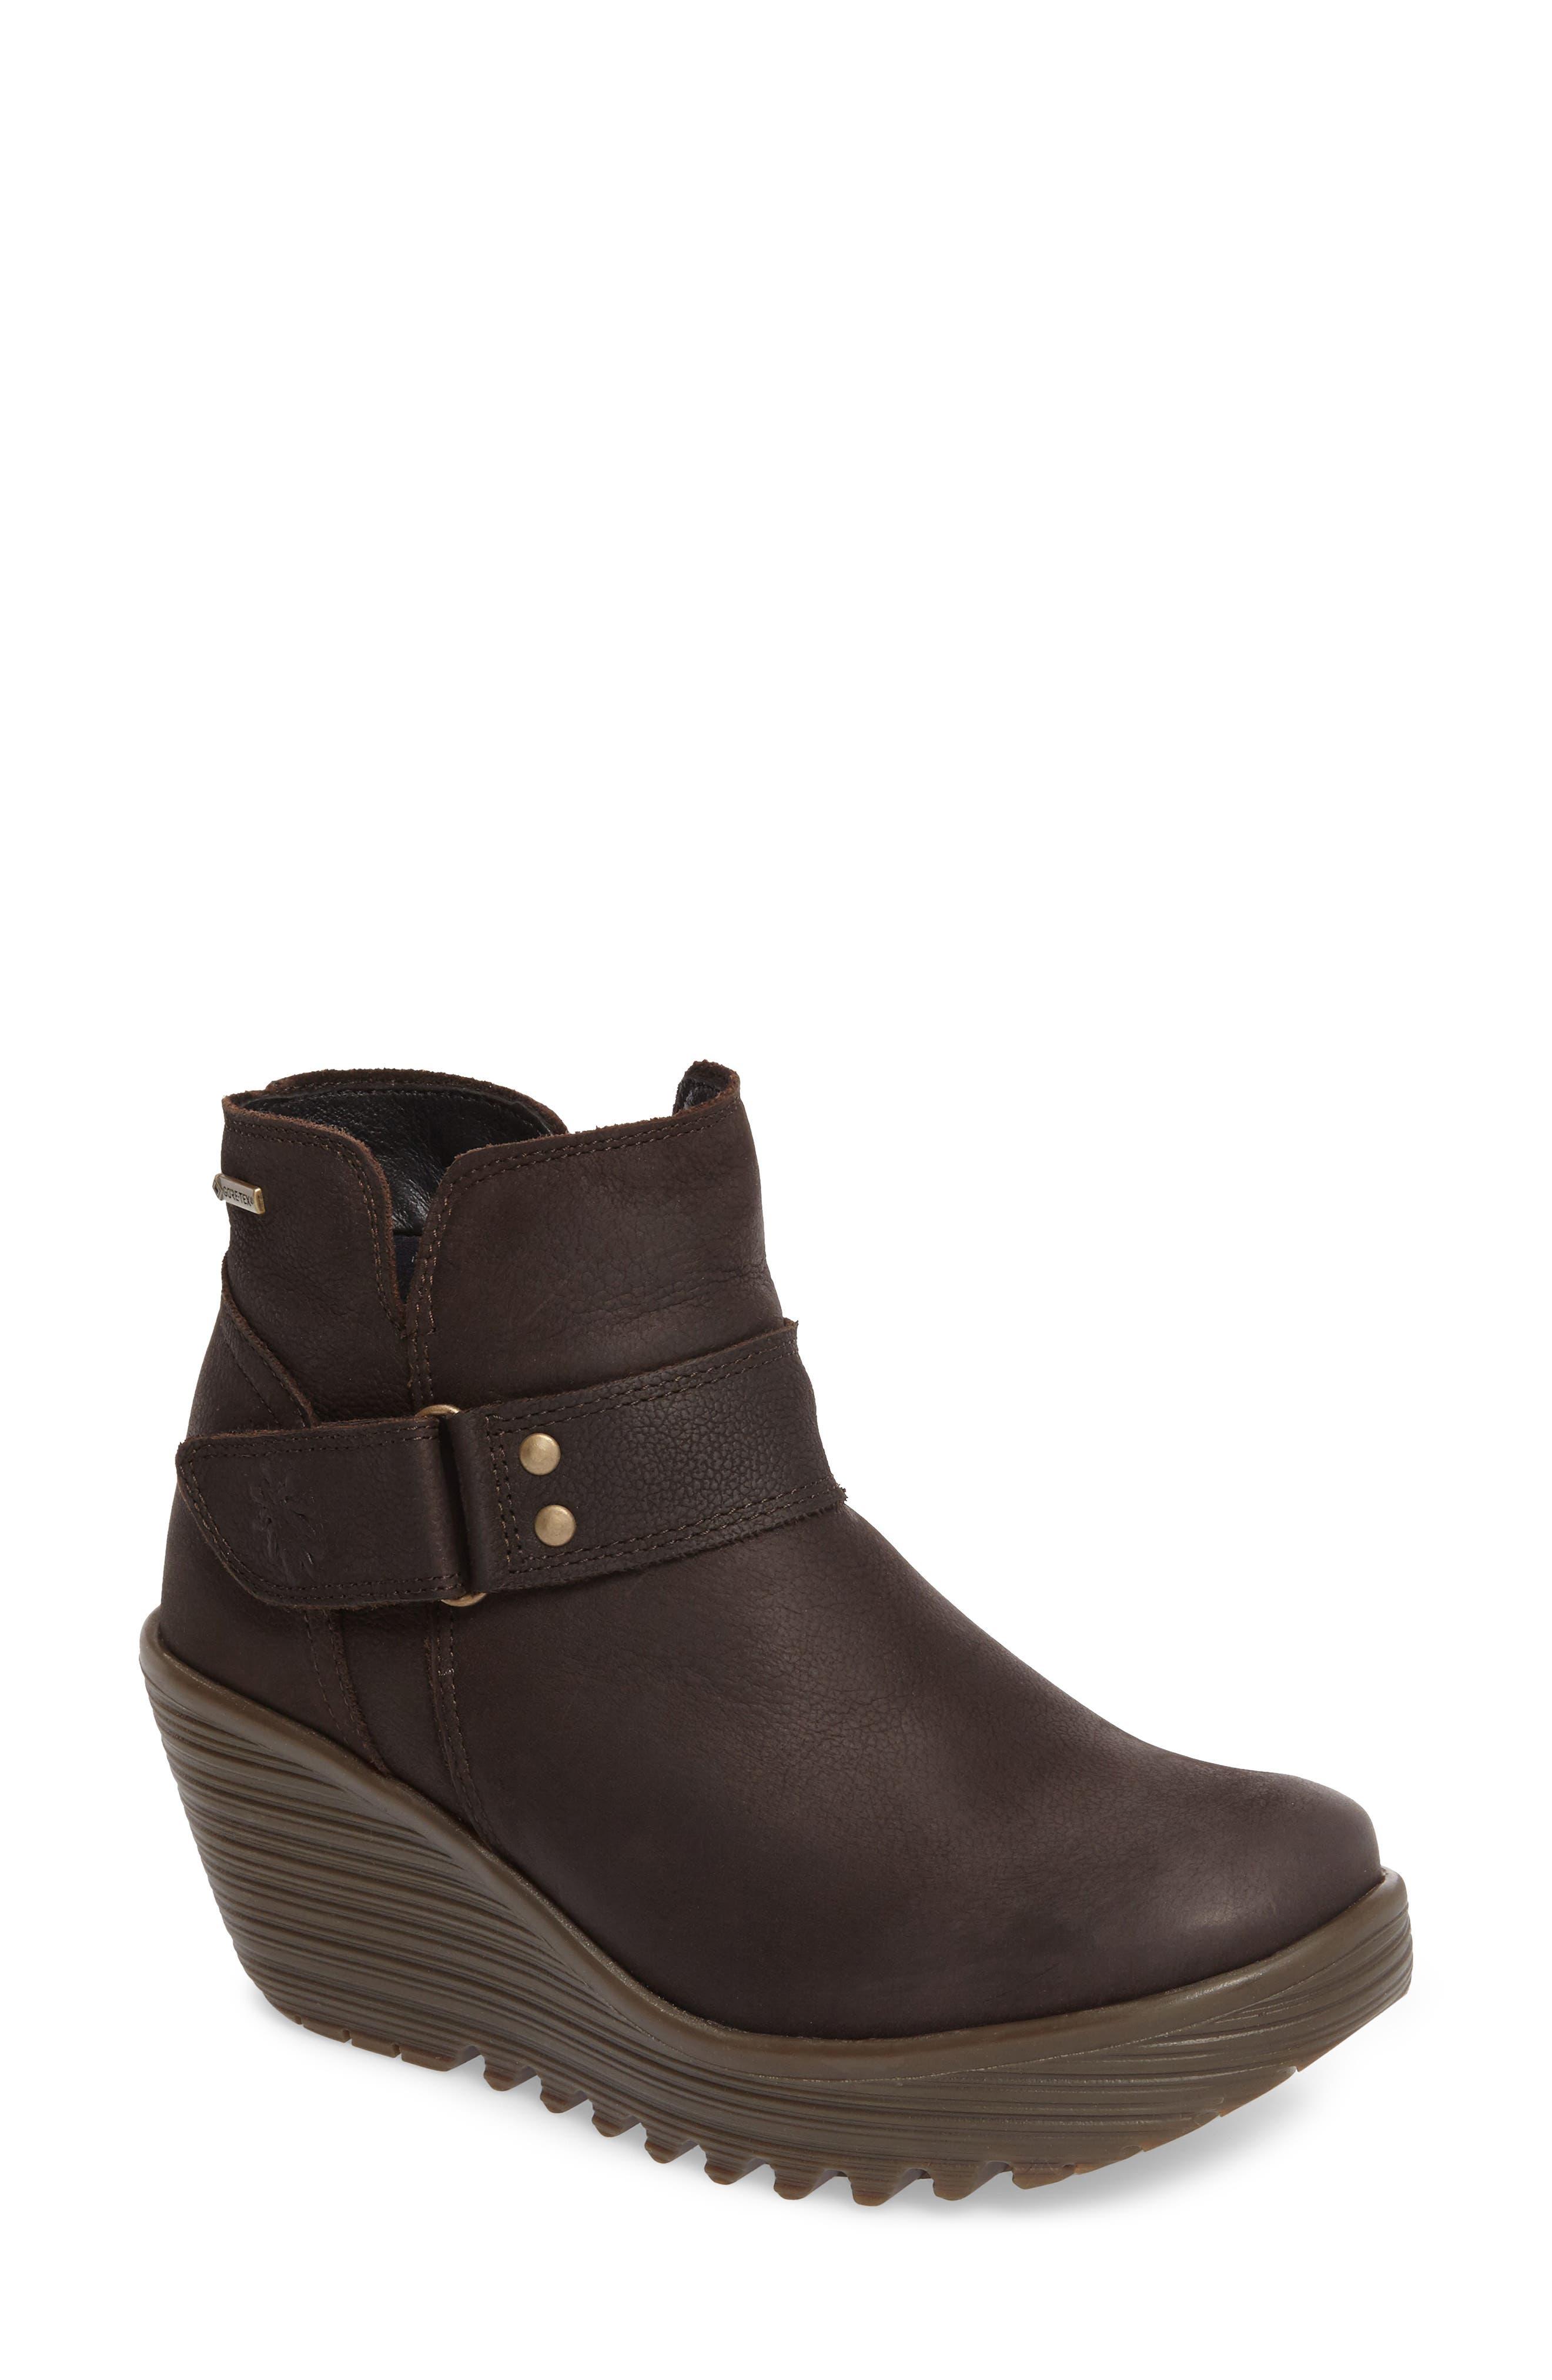 Alternate Image 1 Selected - Fly London Yock Waterproof Gore-Tex® Wedge Boot (Women)